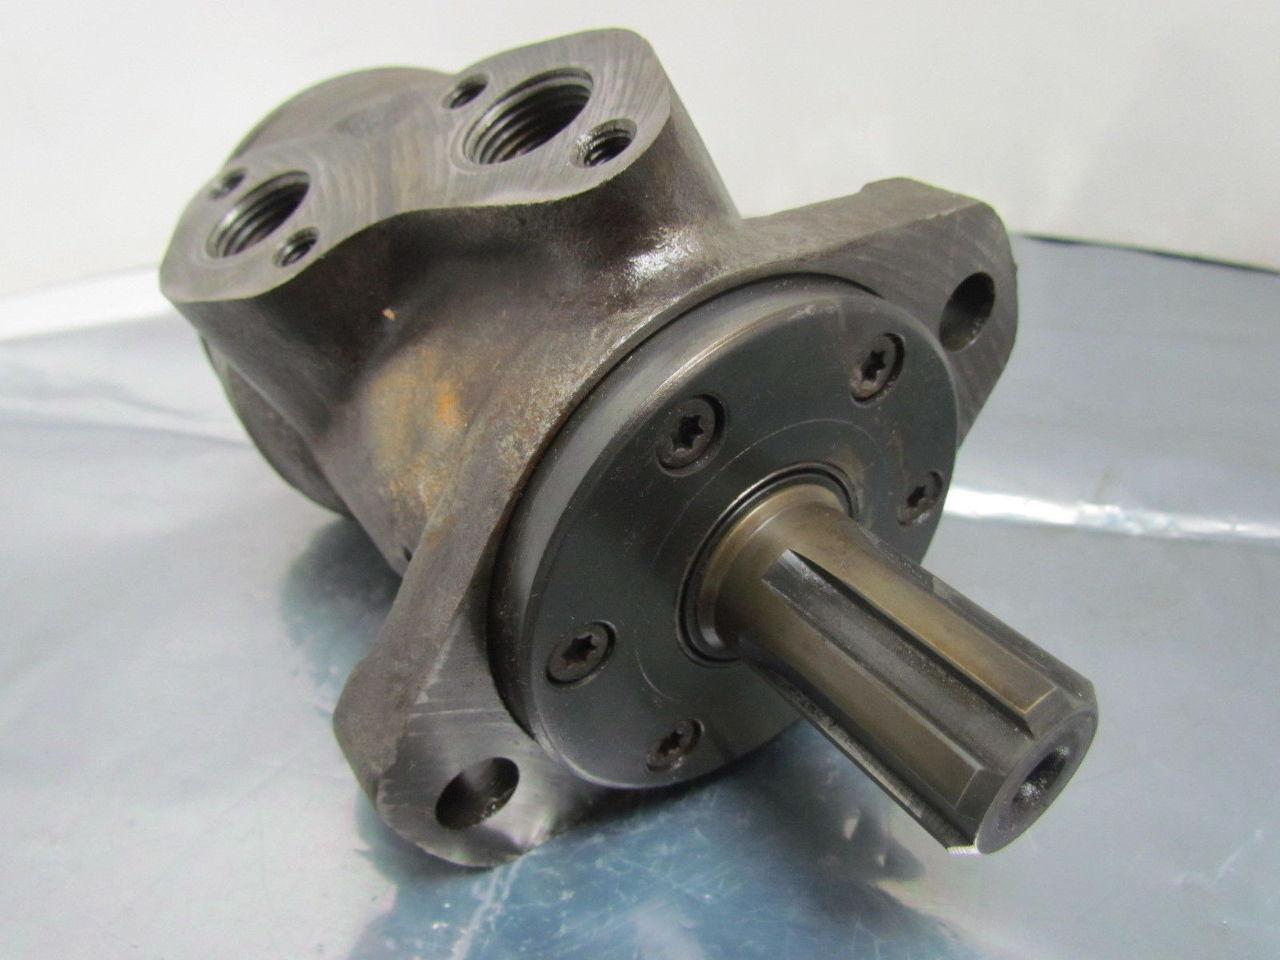 Danfoss 80 151 0236 4 Hydraulic Motor Ebay